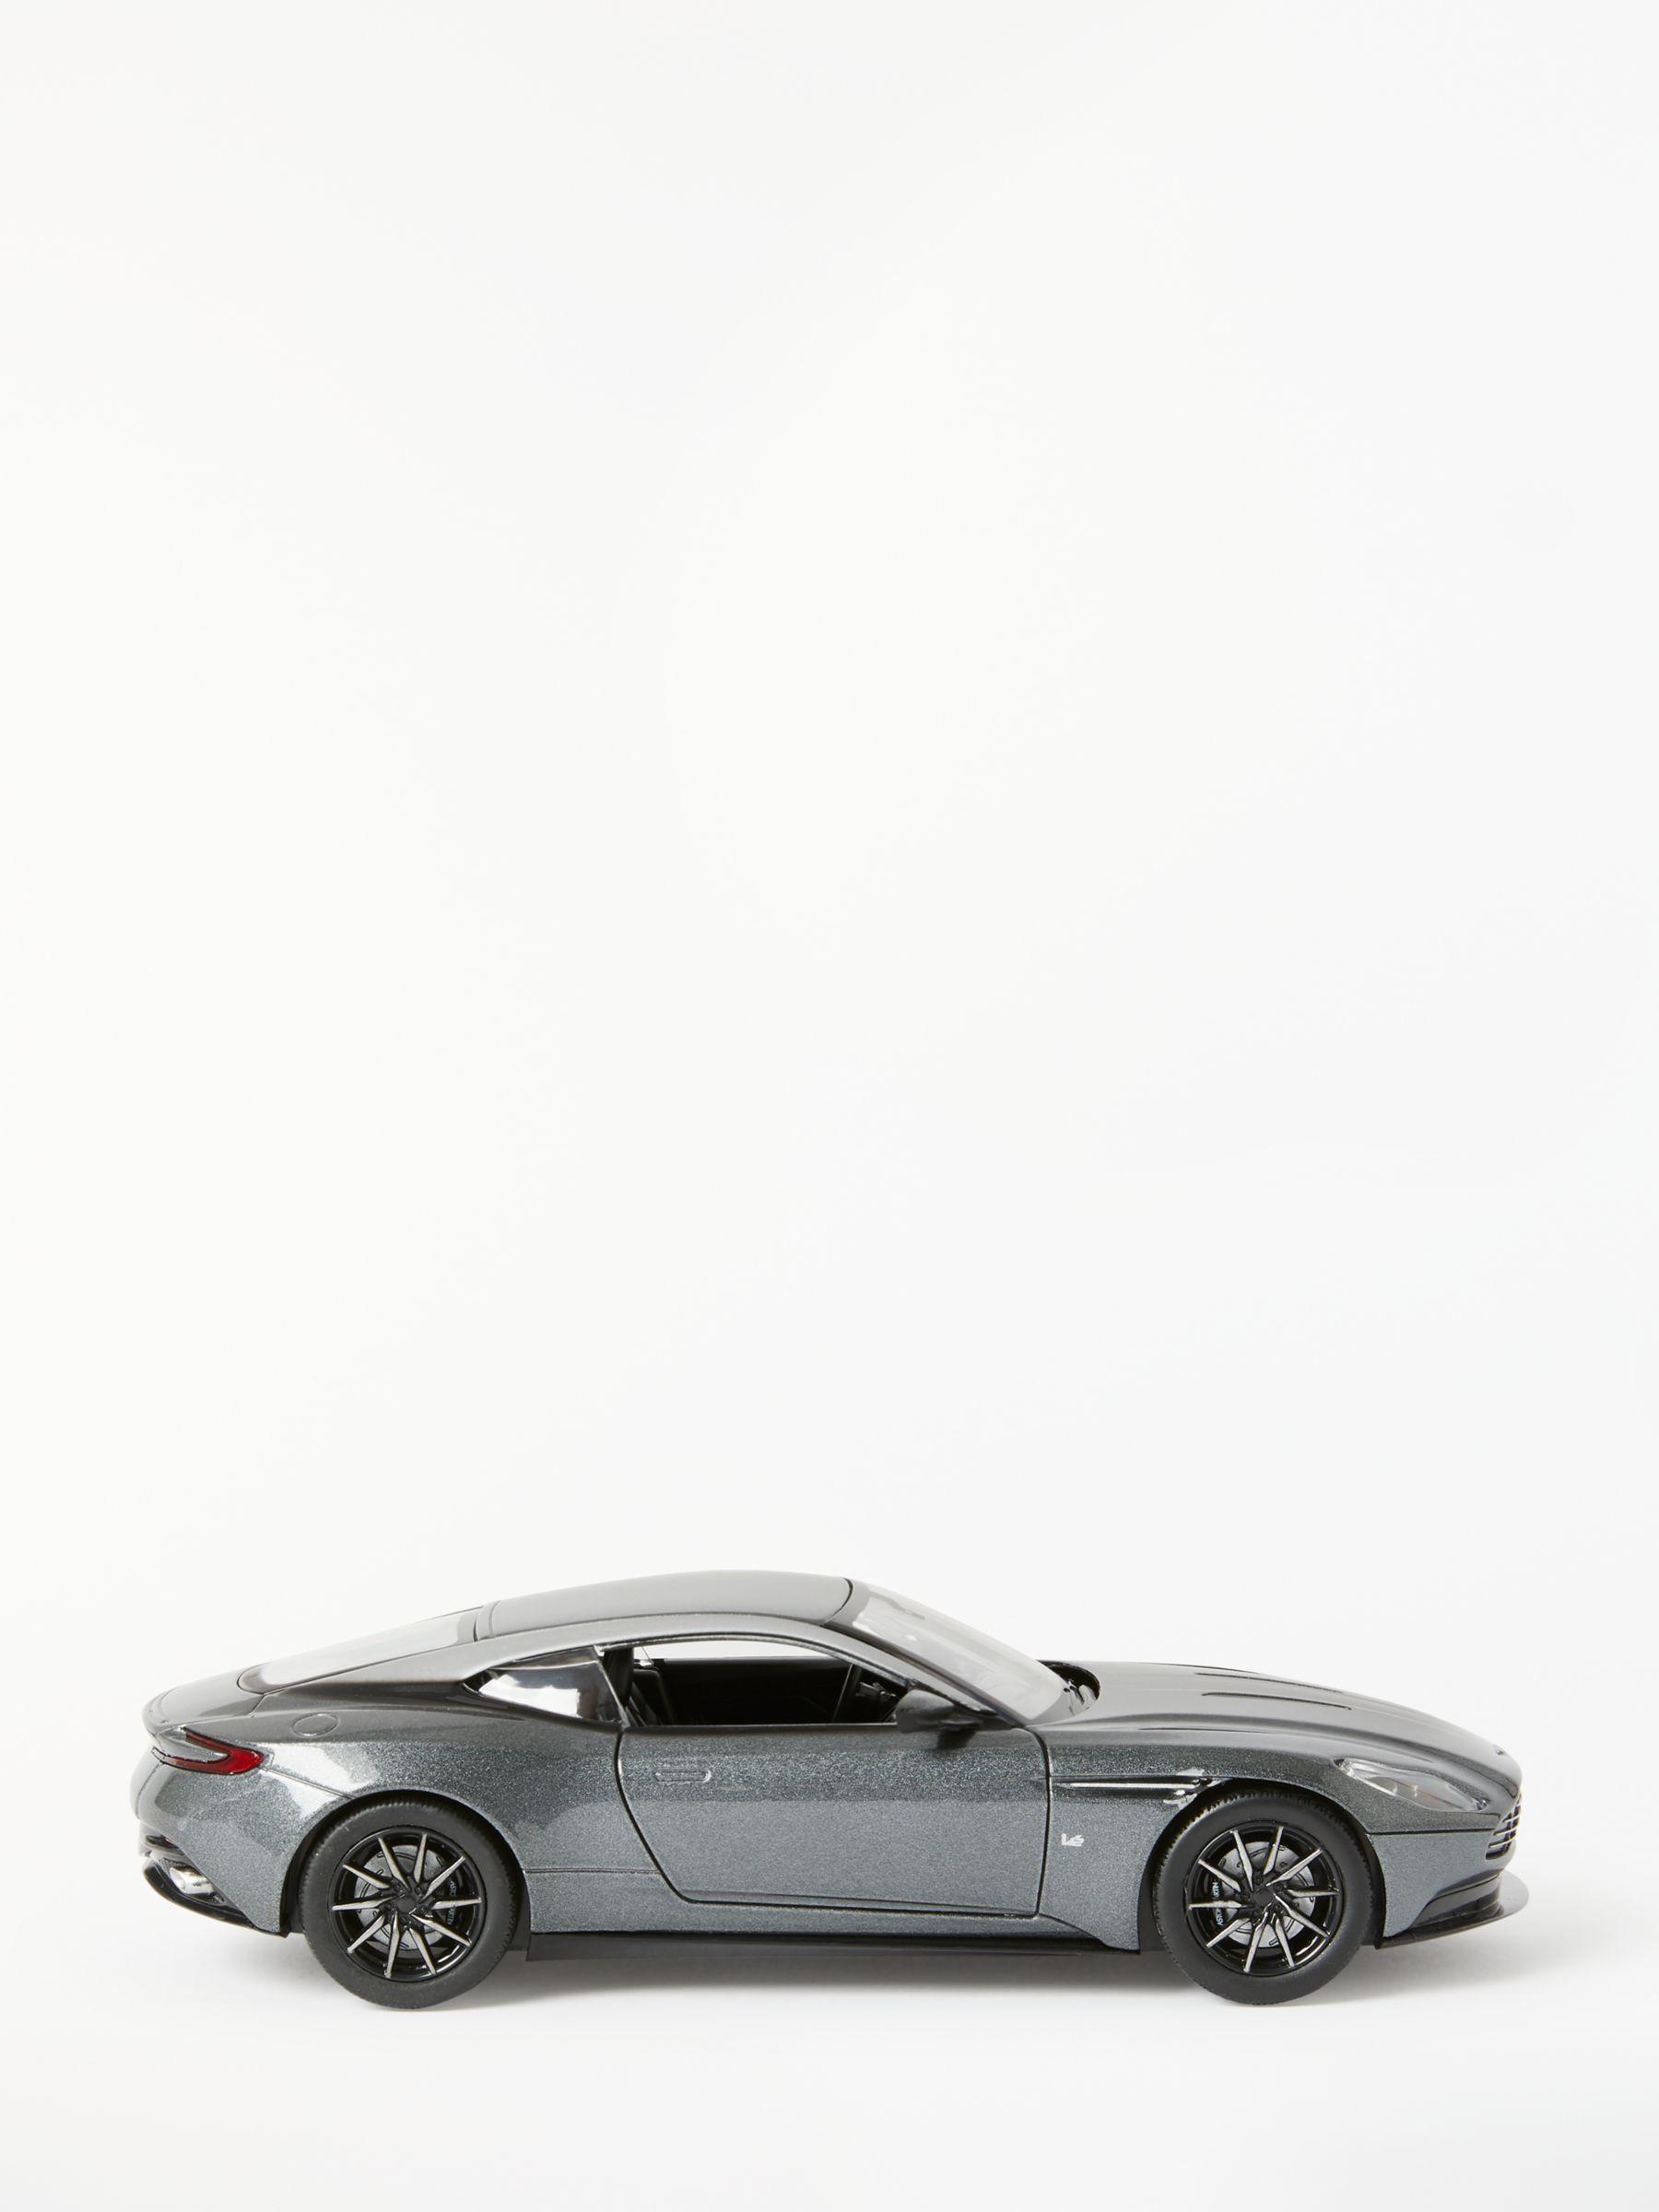 John Lewis Partners 1 24 Aston Martin Db11 Toy Car At John Lewis Partners